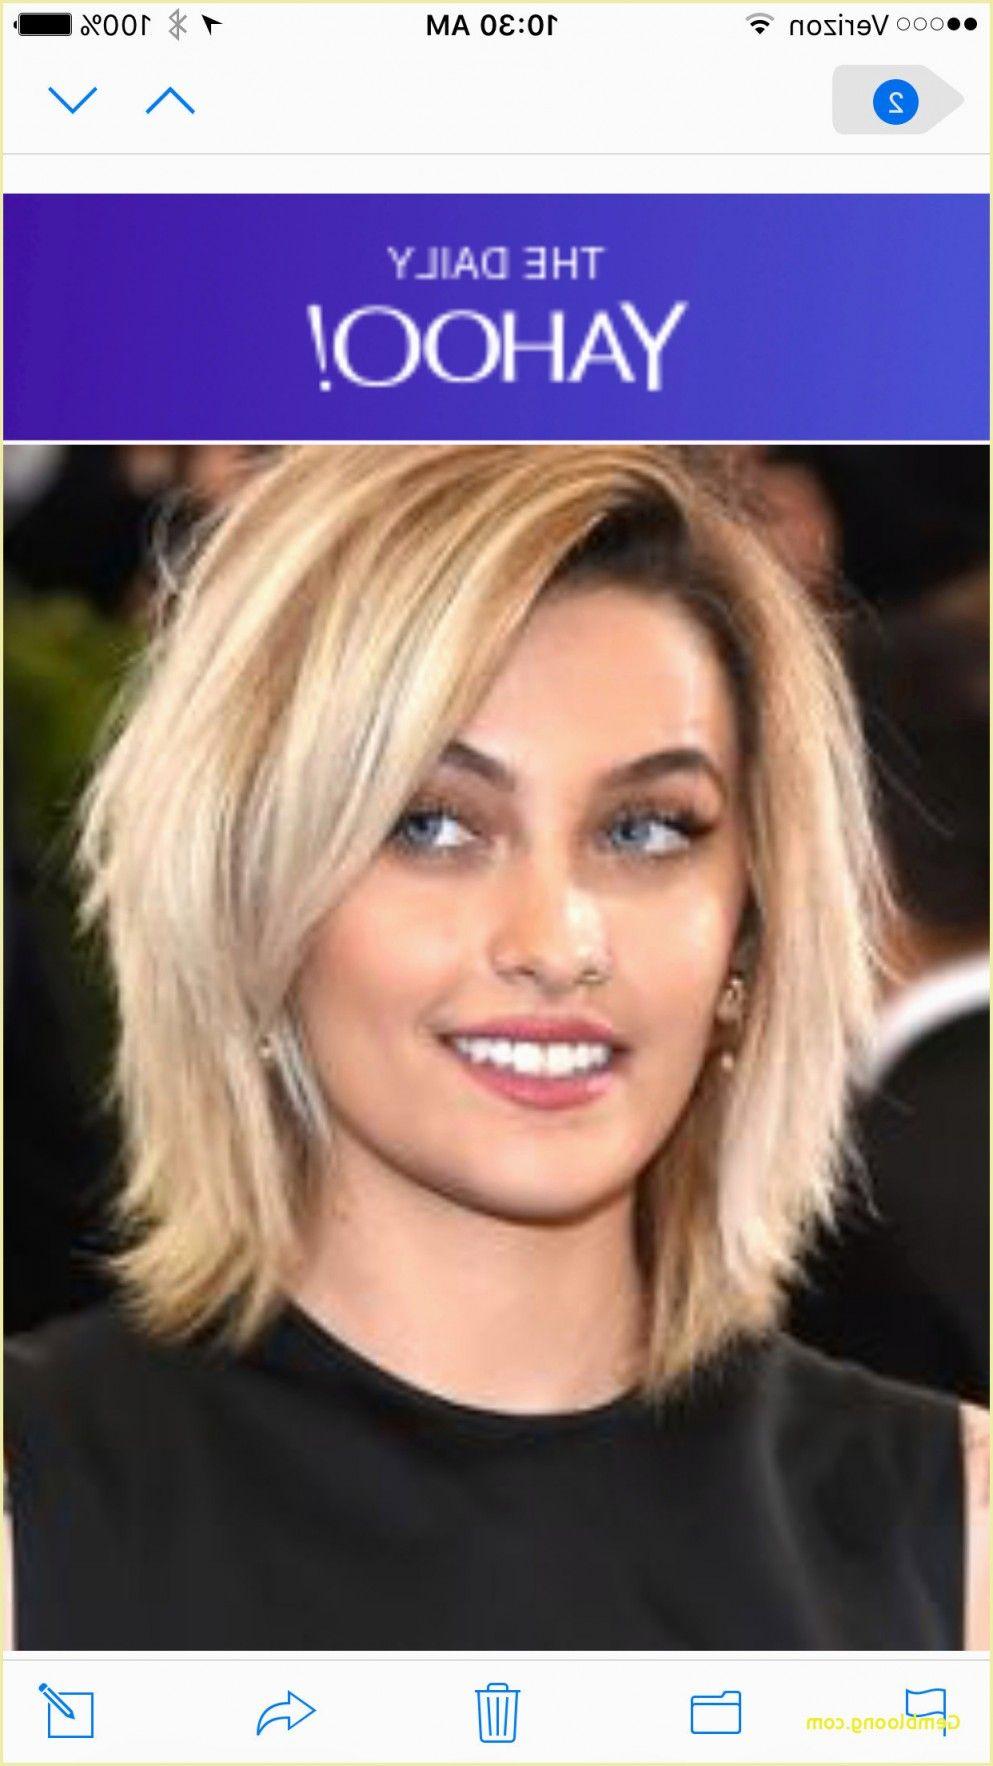 Unique Neue Frisuren Ausprobieren Frisuren Kurze Haare Stylen Frisur Langes Gesicht Langhaarfrisuren